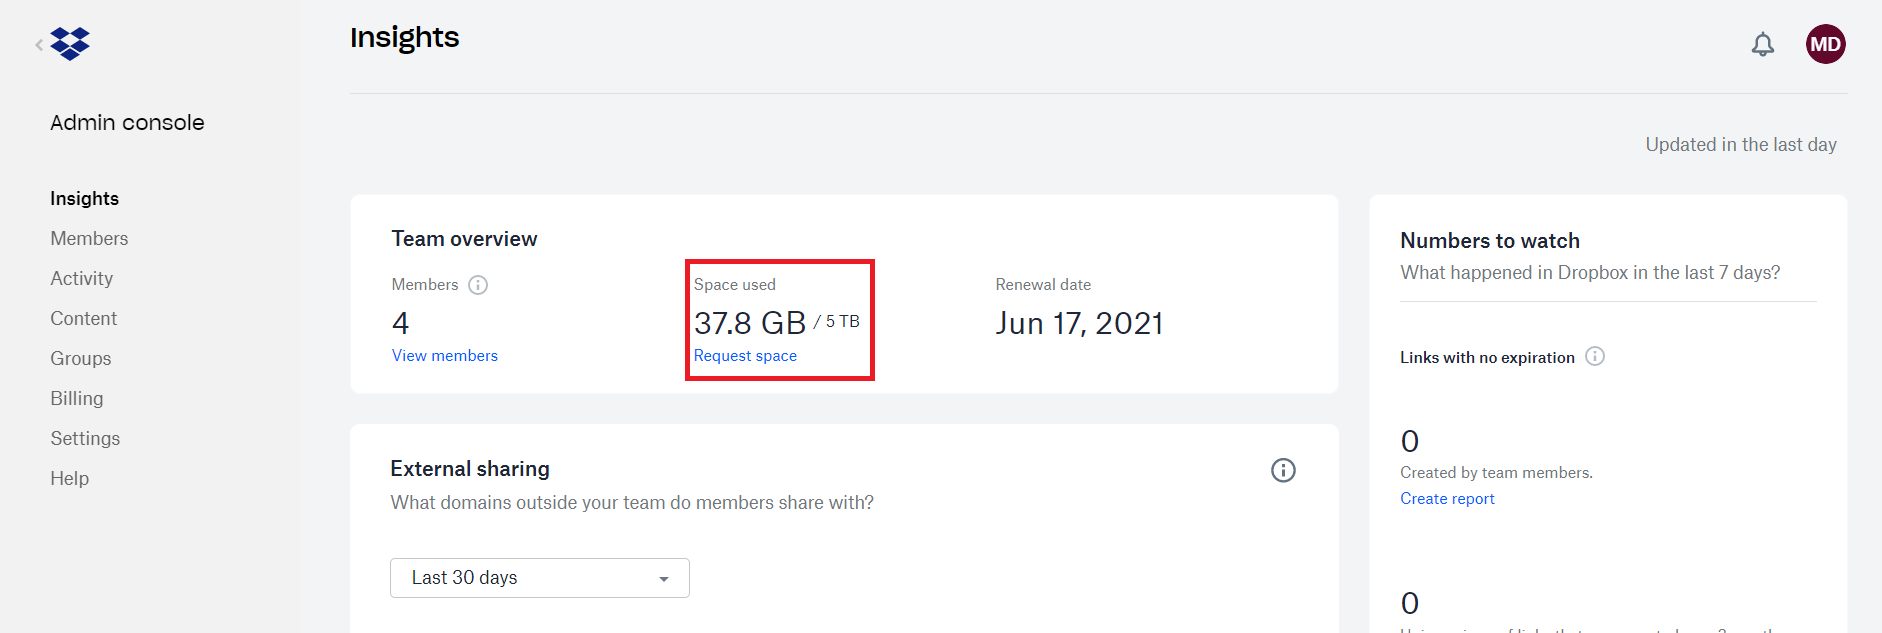 Insights_-_Dropbox_-_Google_Chrome_2020-07-03_12.0.png